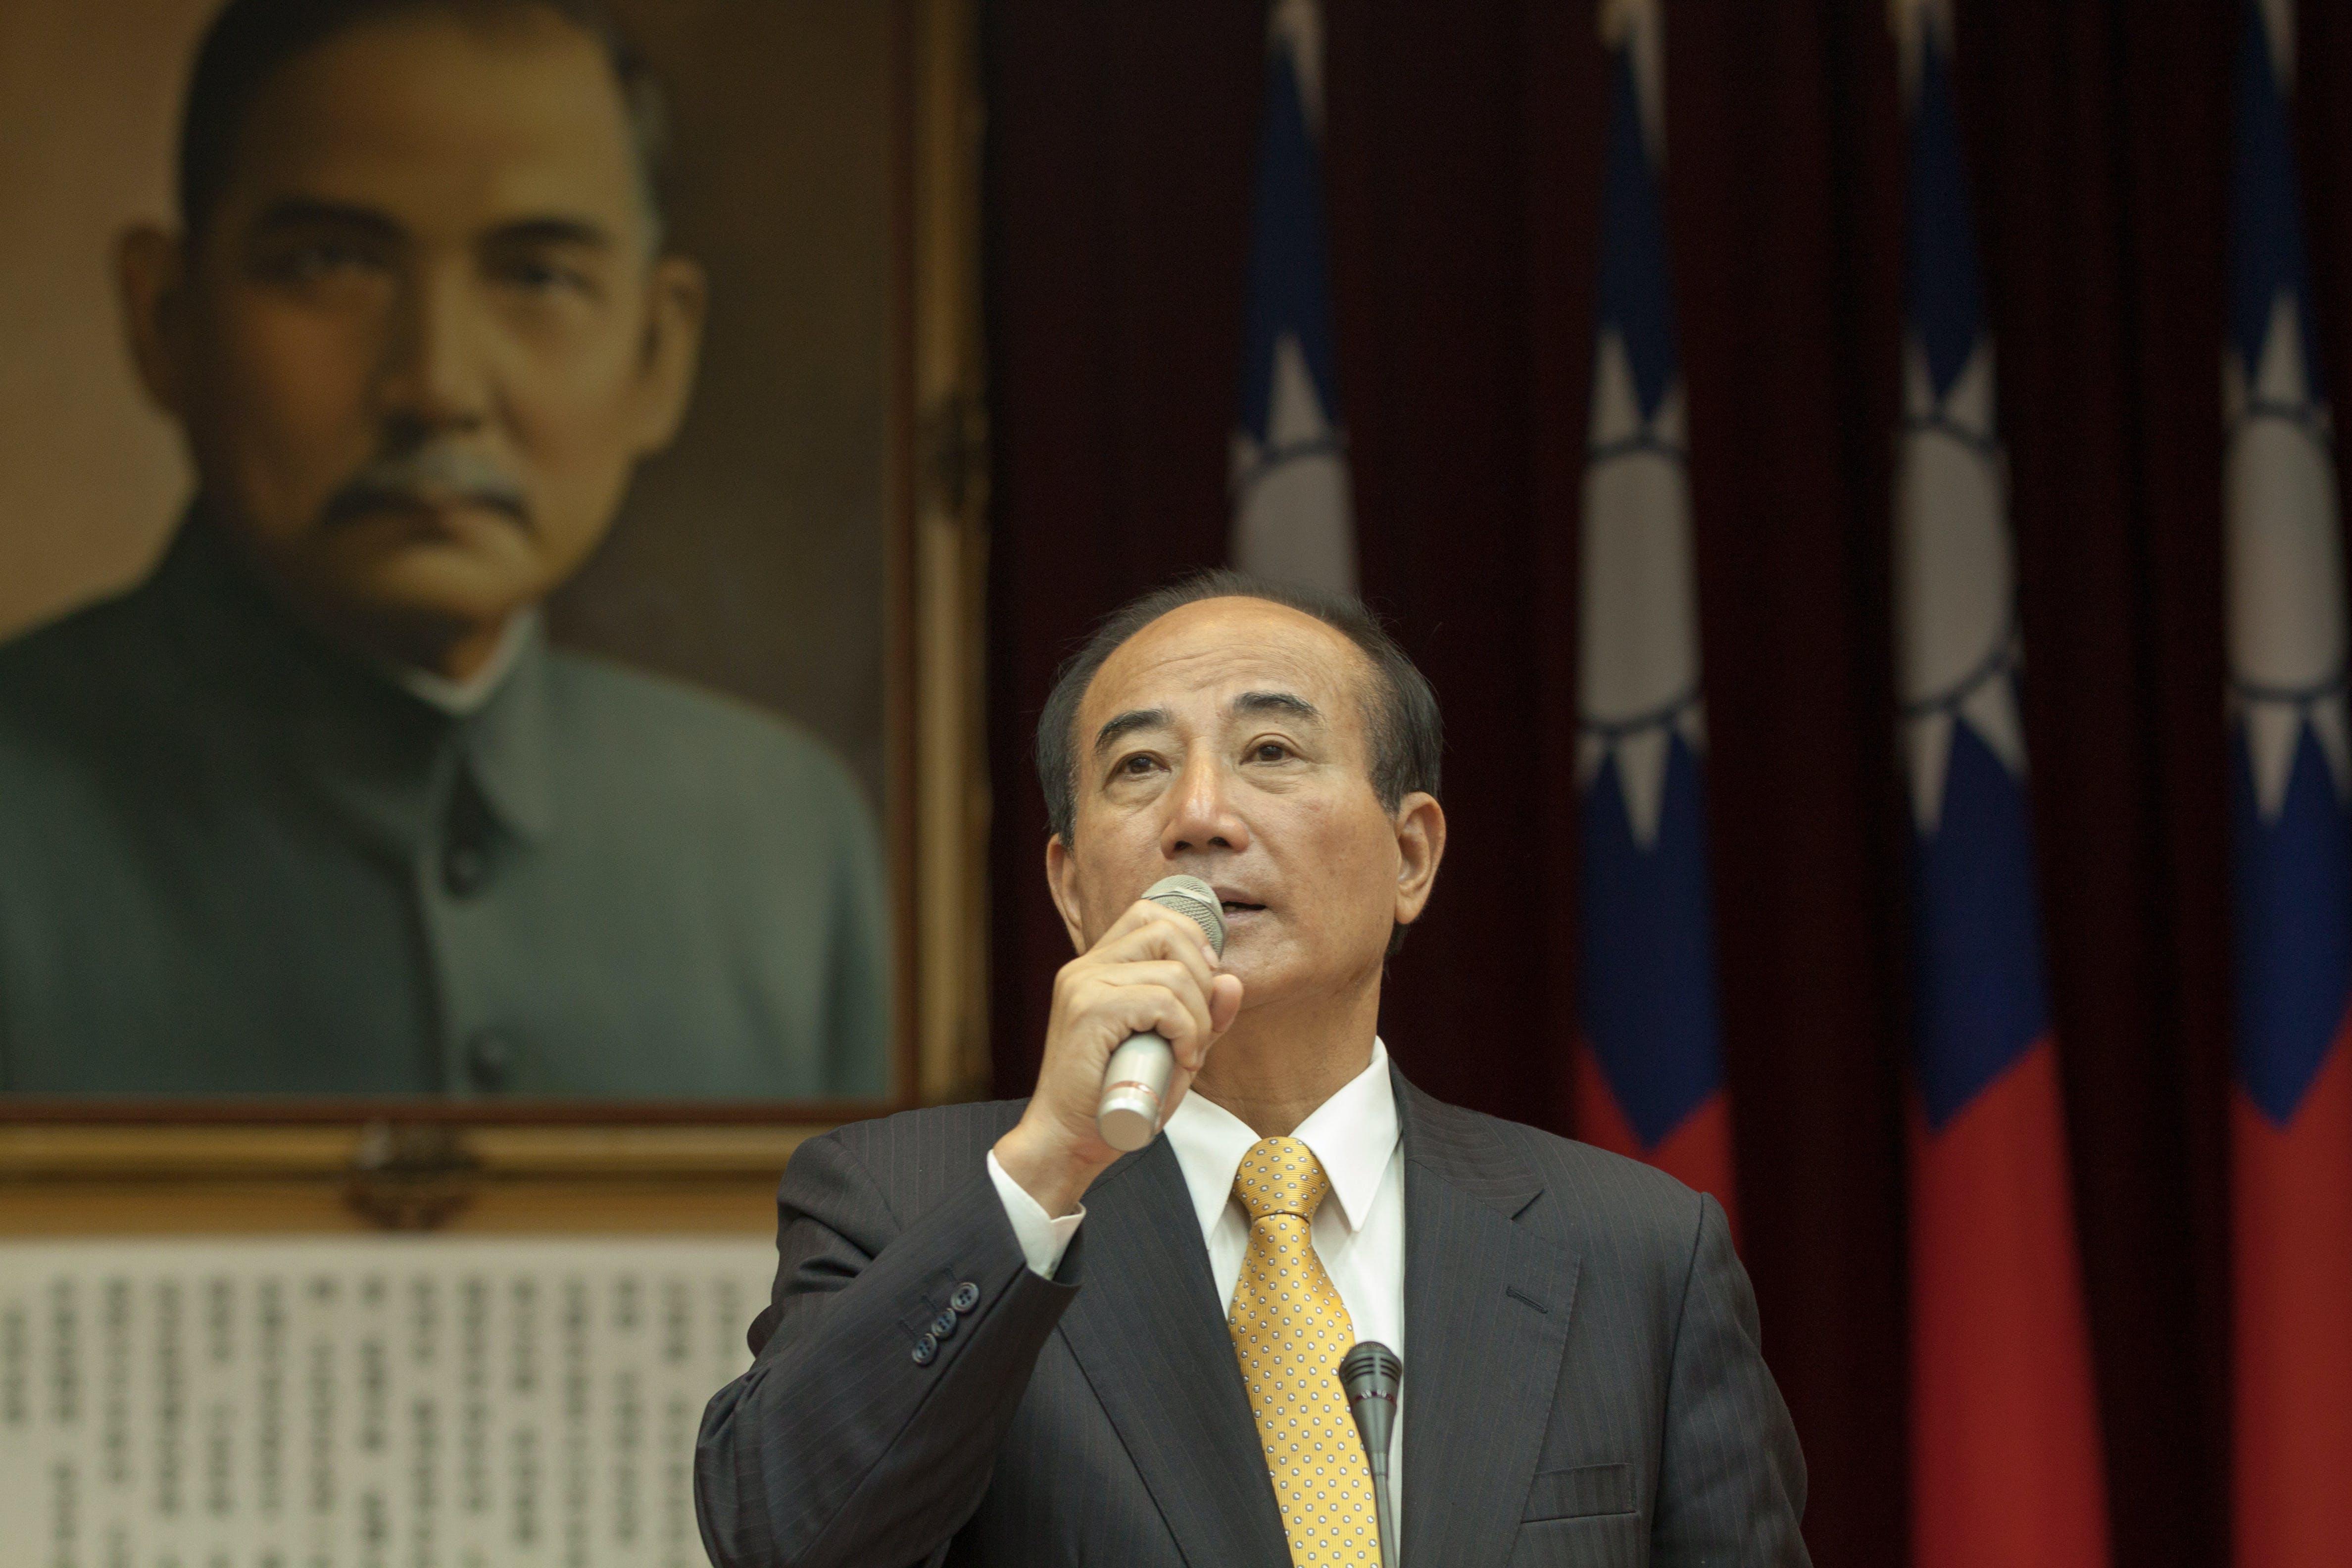 Wang_Jin-pyng,_President_of_the_Legislat